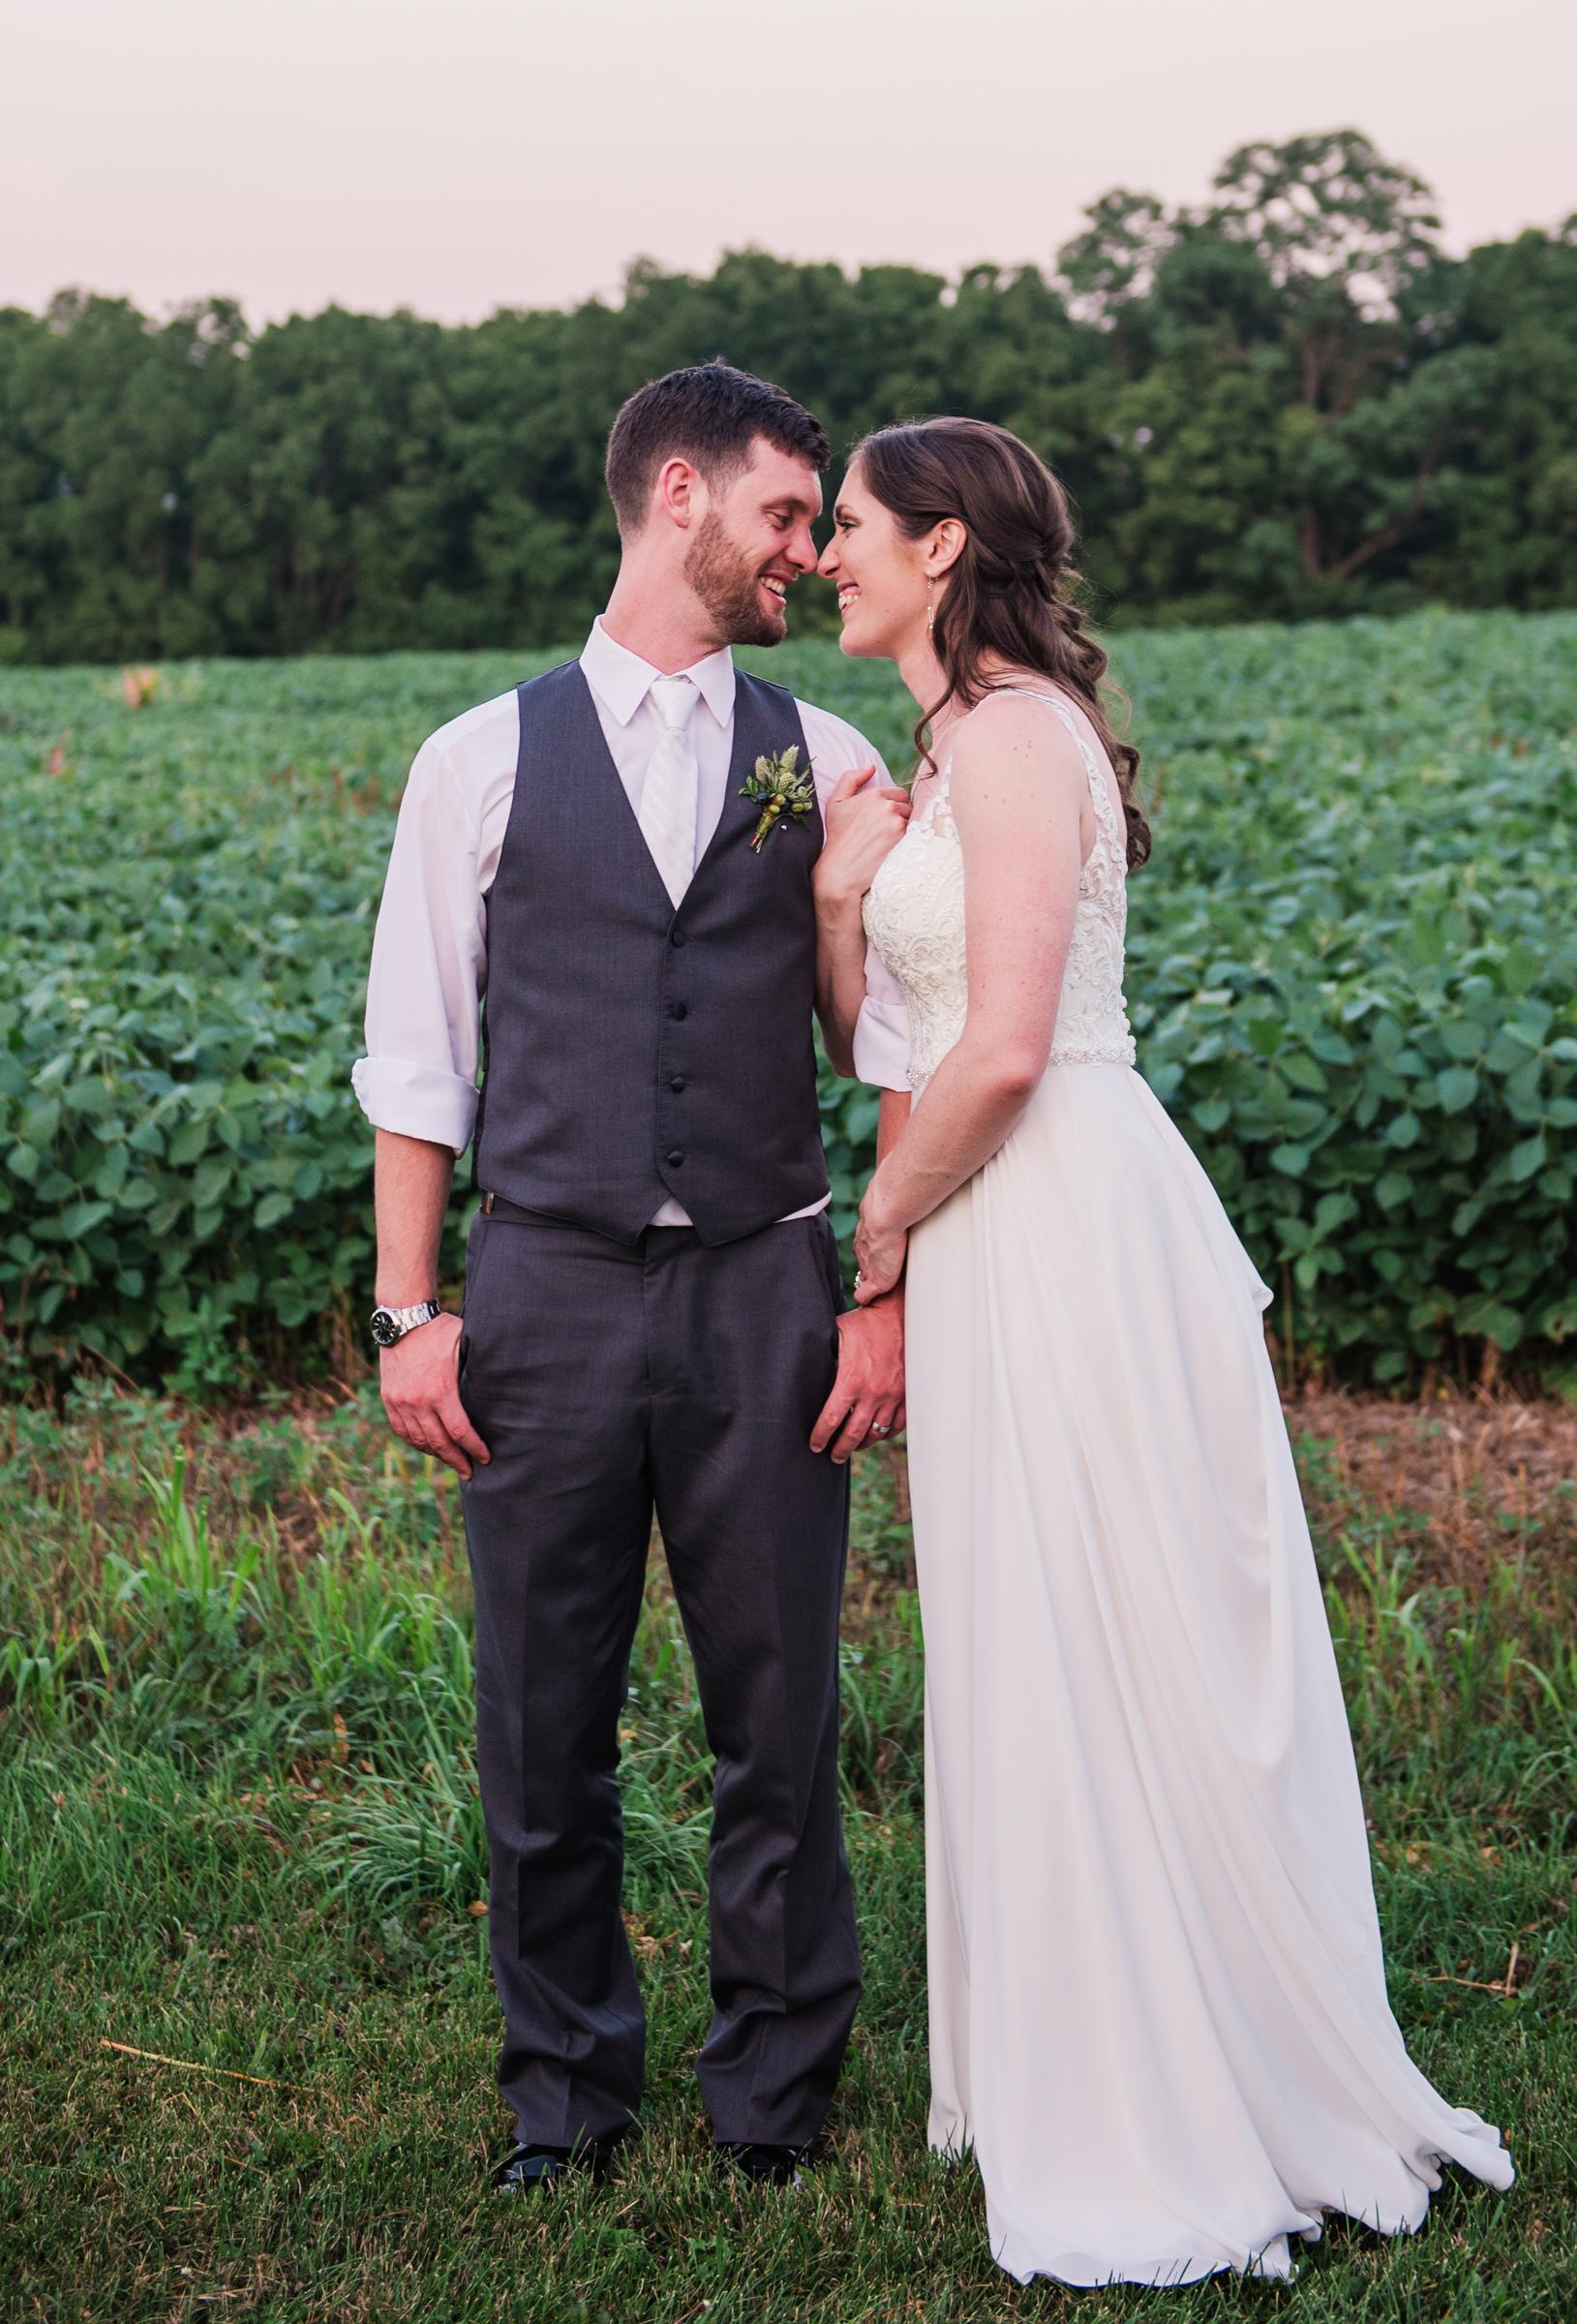 Jerris_Wadsworth_Wedding_Barn_Rochester_Wedding_JILL_STUDIO_Rochester_NY_Photographer_DSC_3143.jpg